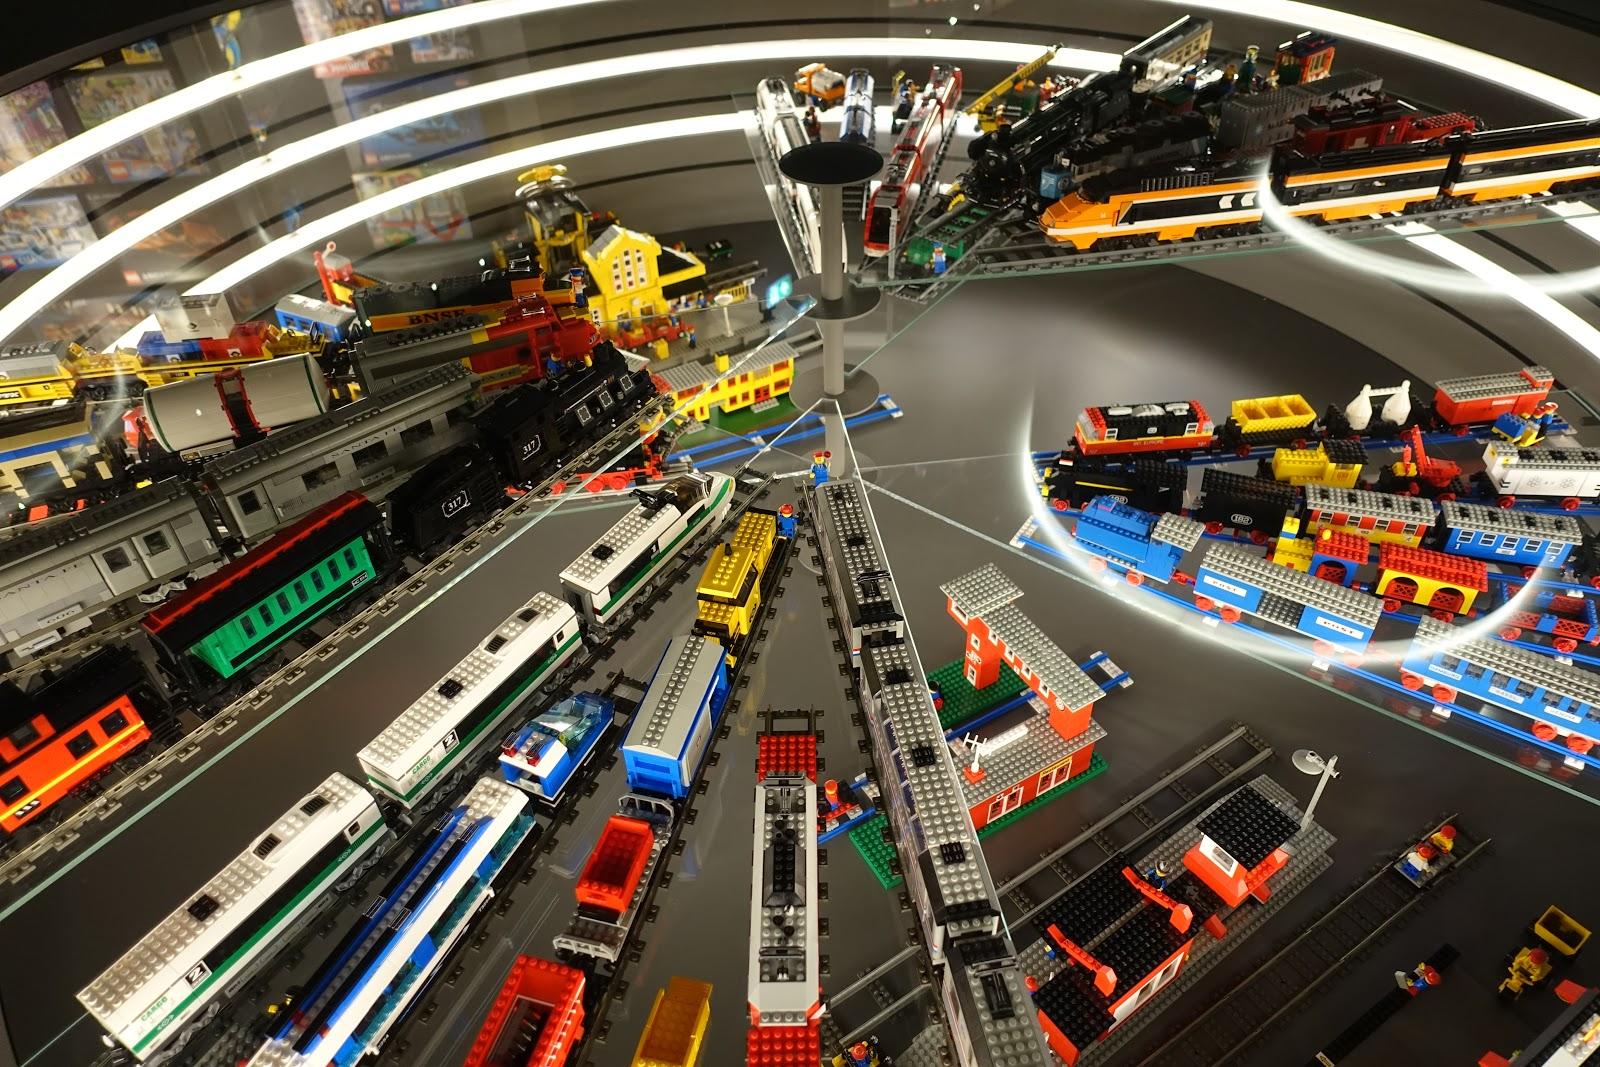 travelling allrite: Lego House